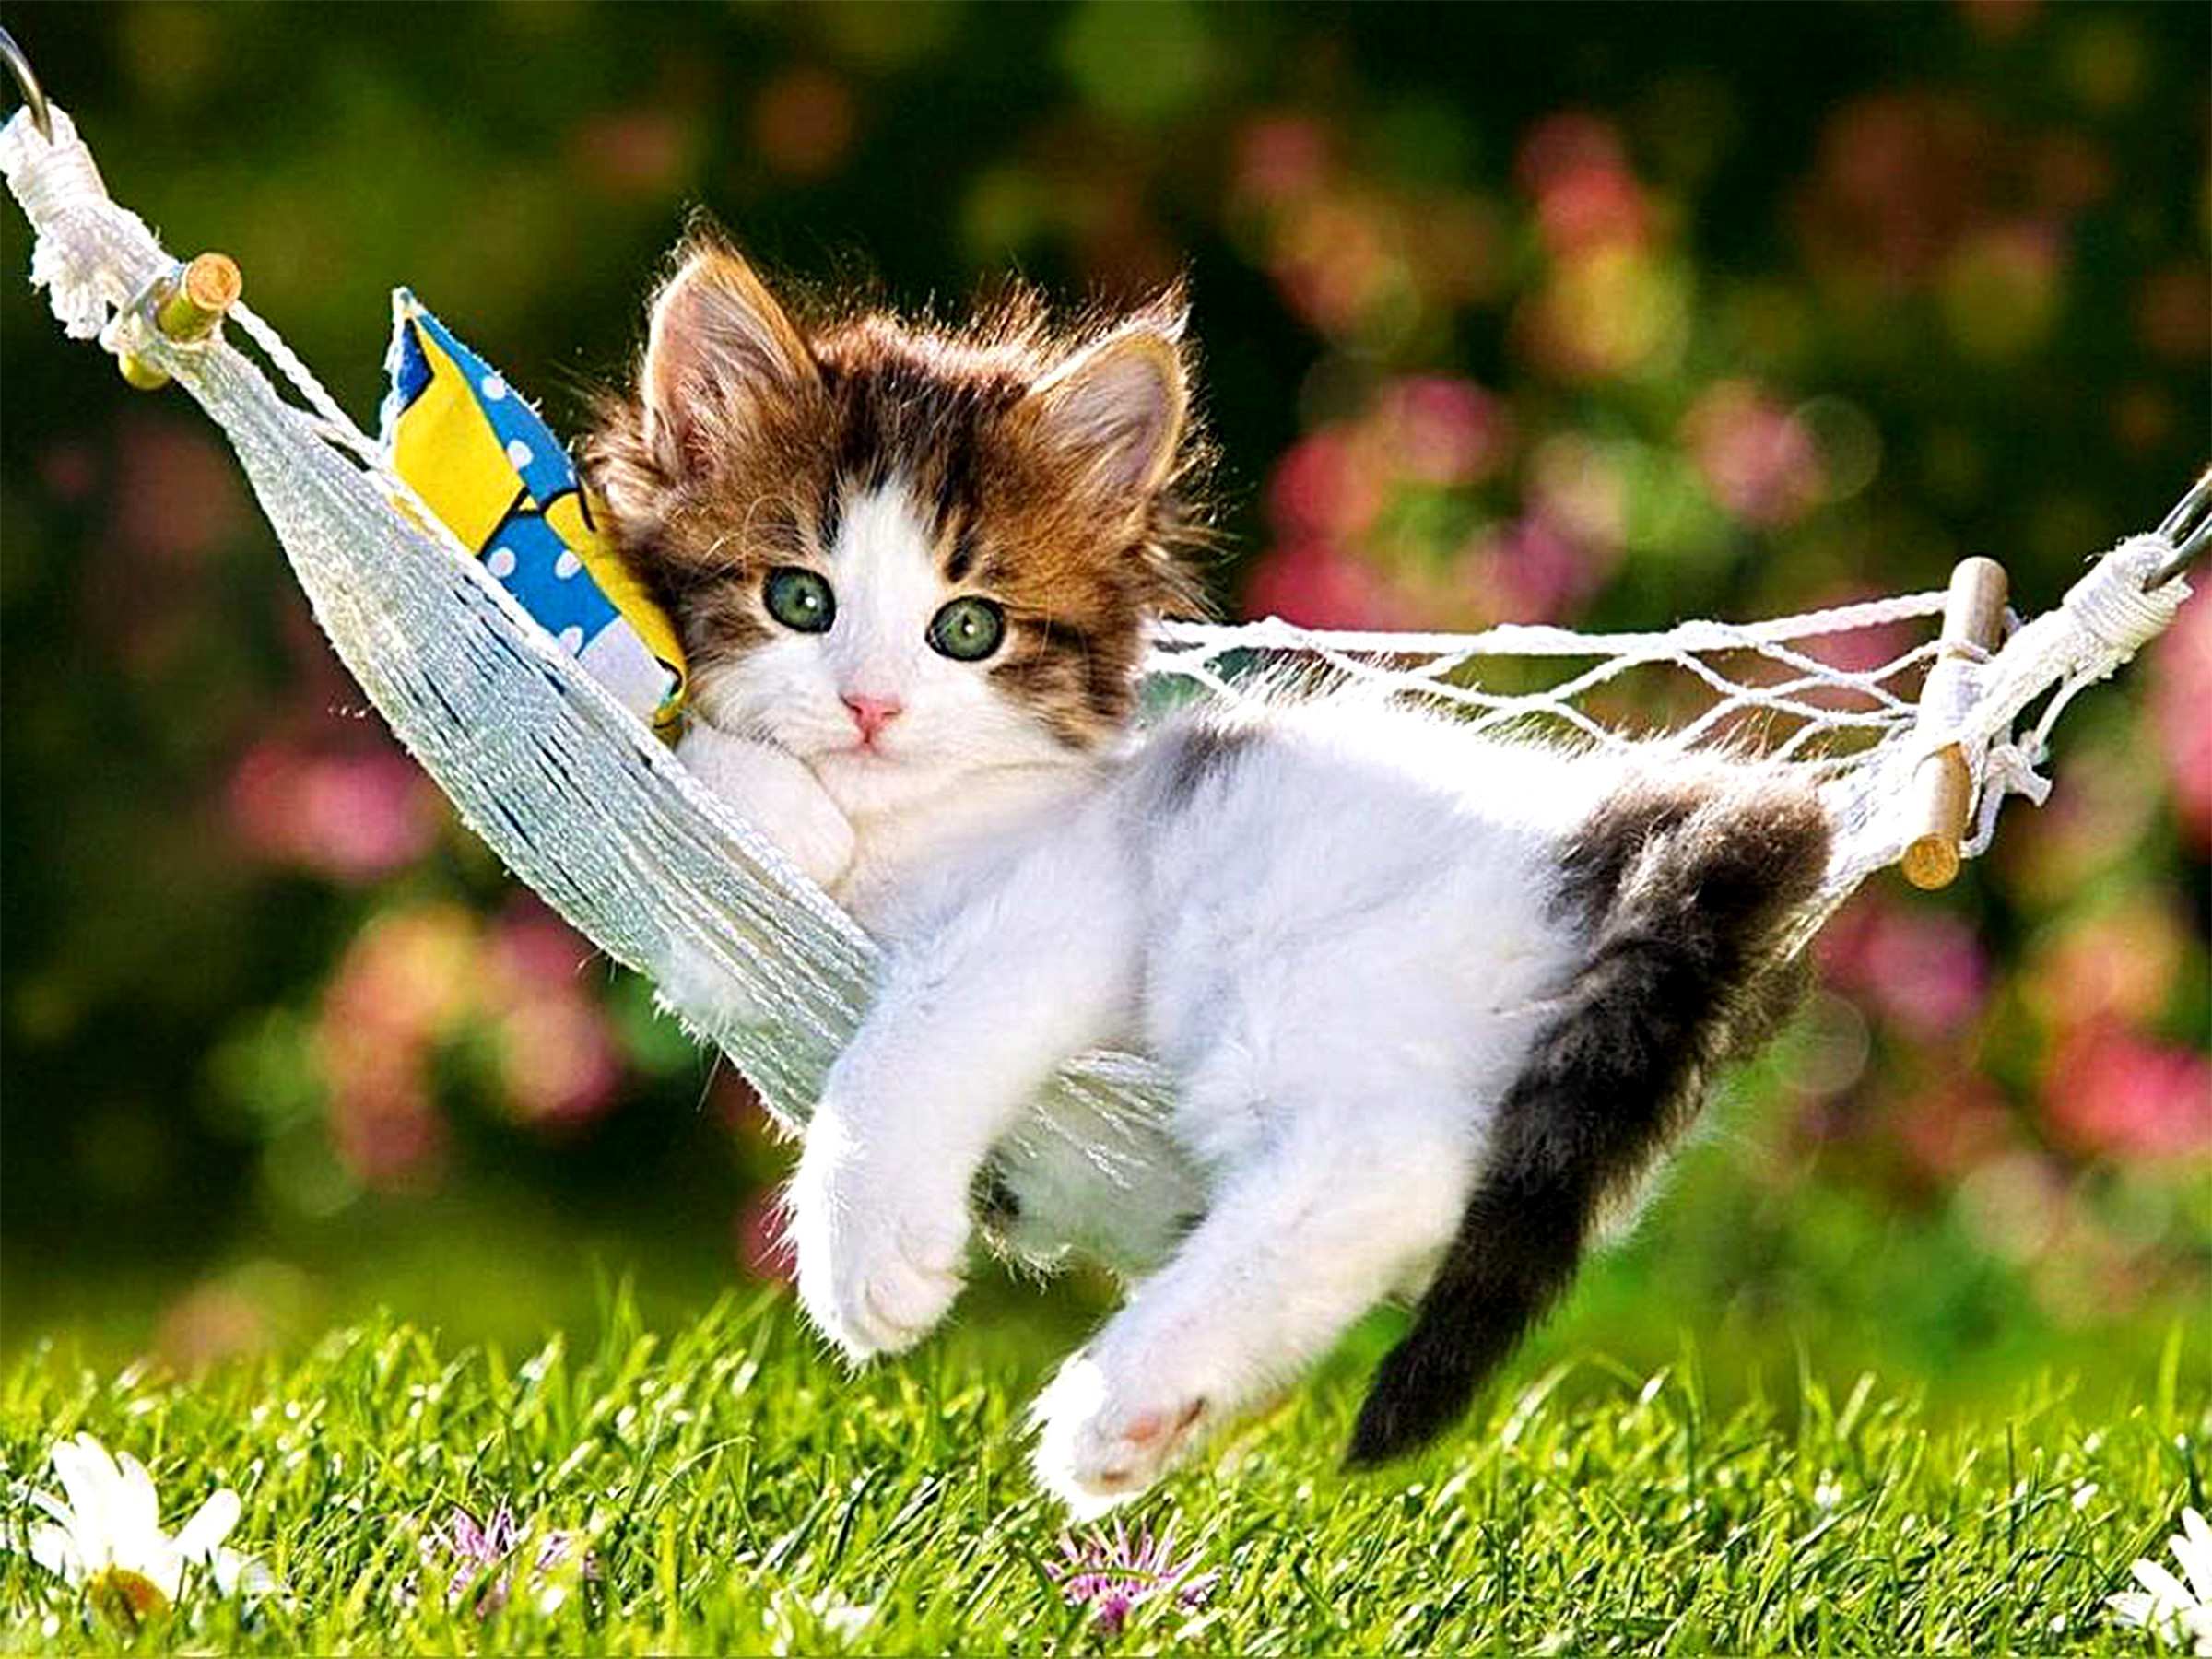 Kitty cat desktop wallpaper 64 images 2400x1800 wallpaperlite free hd desktop wallpaper download colorful thecheapjerseys Choice Image